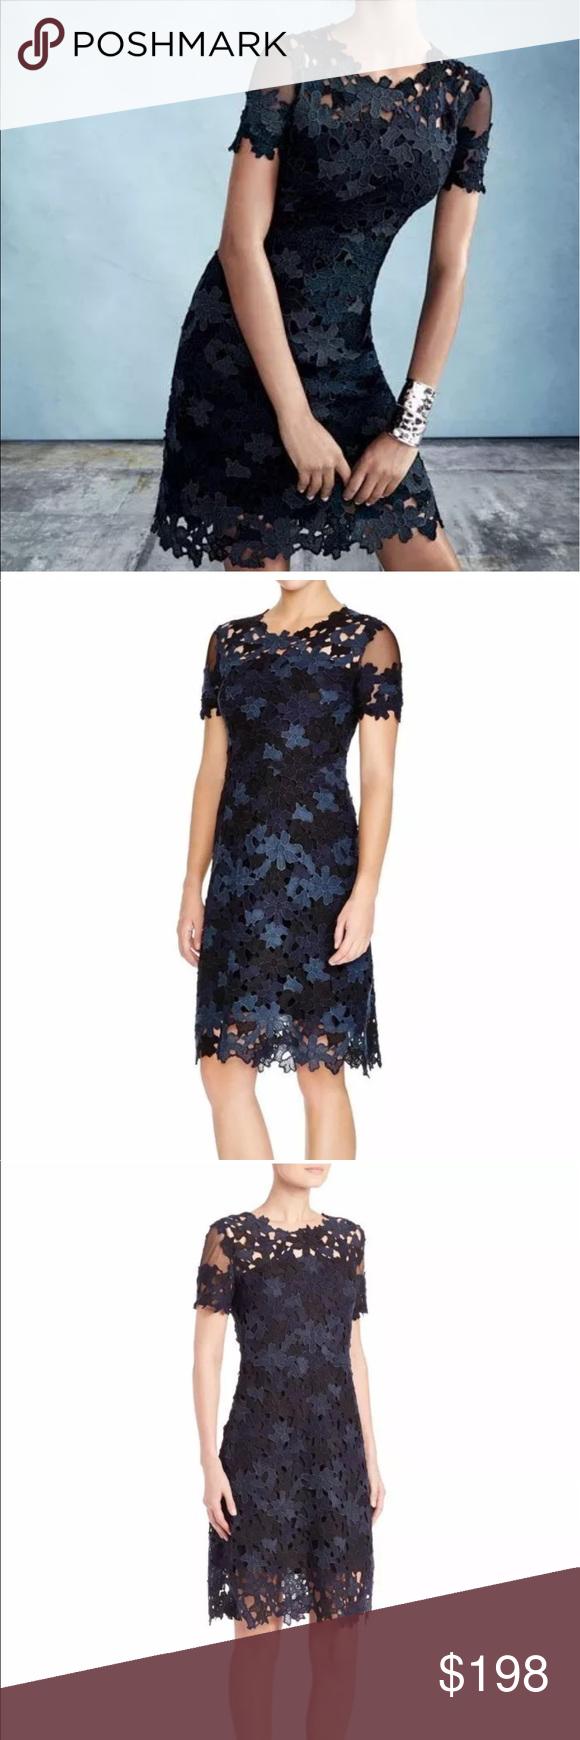 Host Pick Nwt Elie Tahari Crochet Ophilia Black Crochet Dress Elie Tahari Clothes Design [ 1740 x 580 Pixel ]